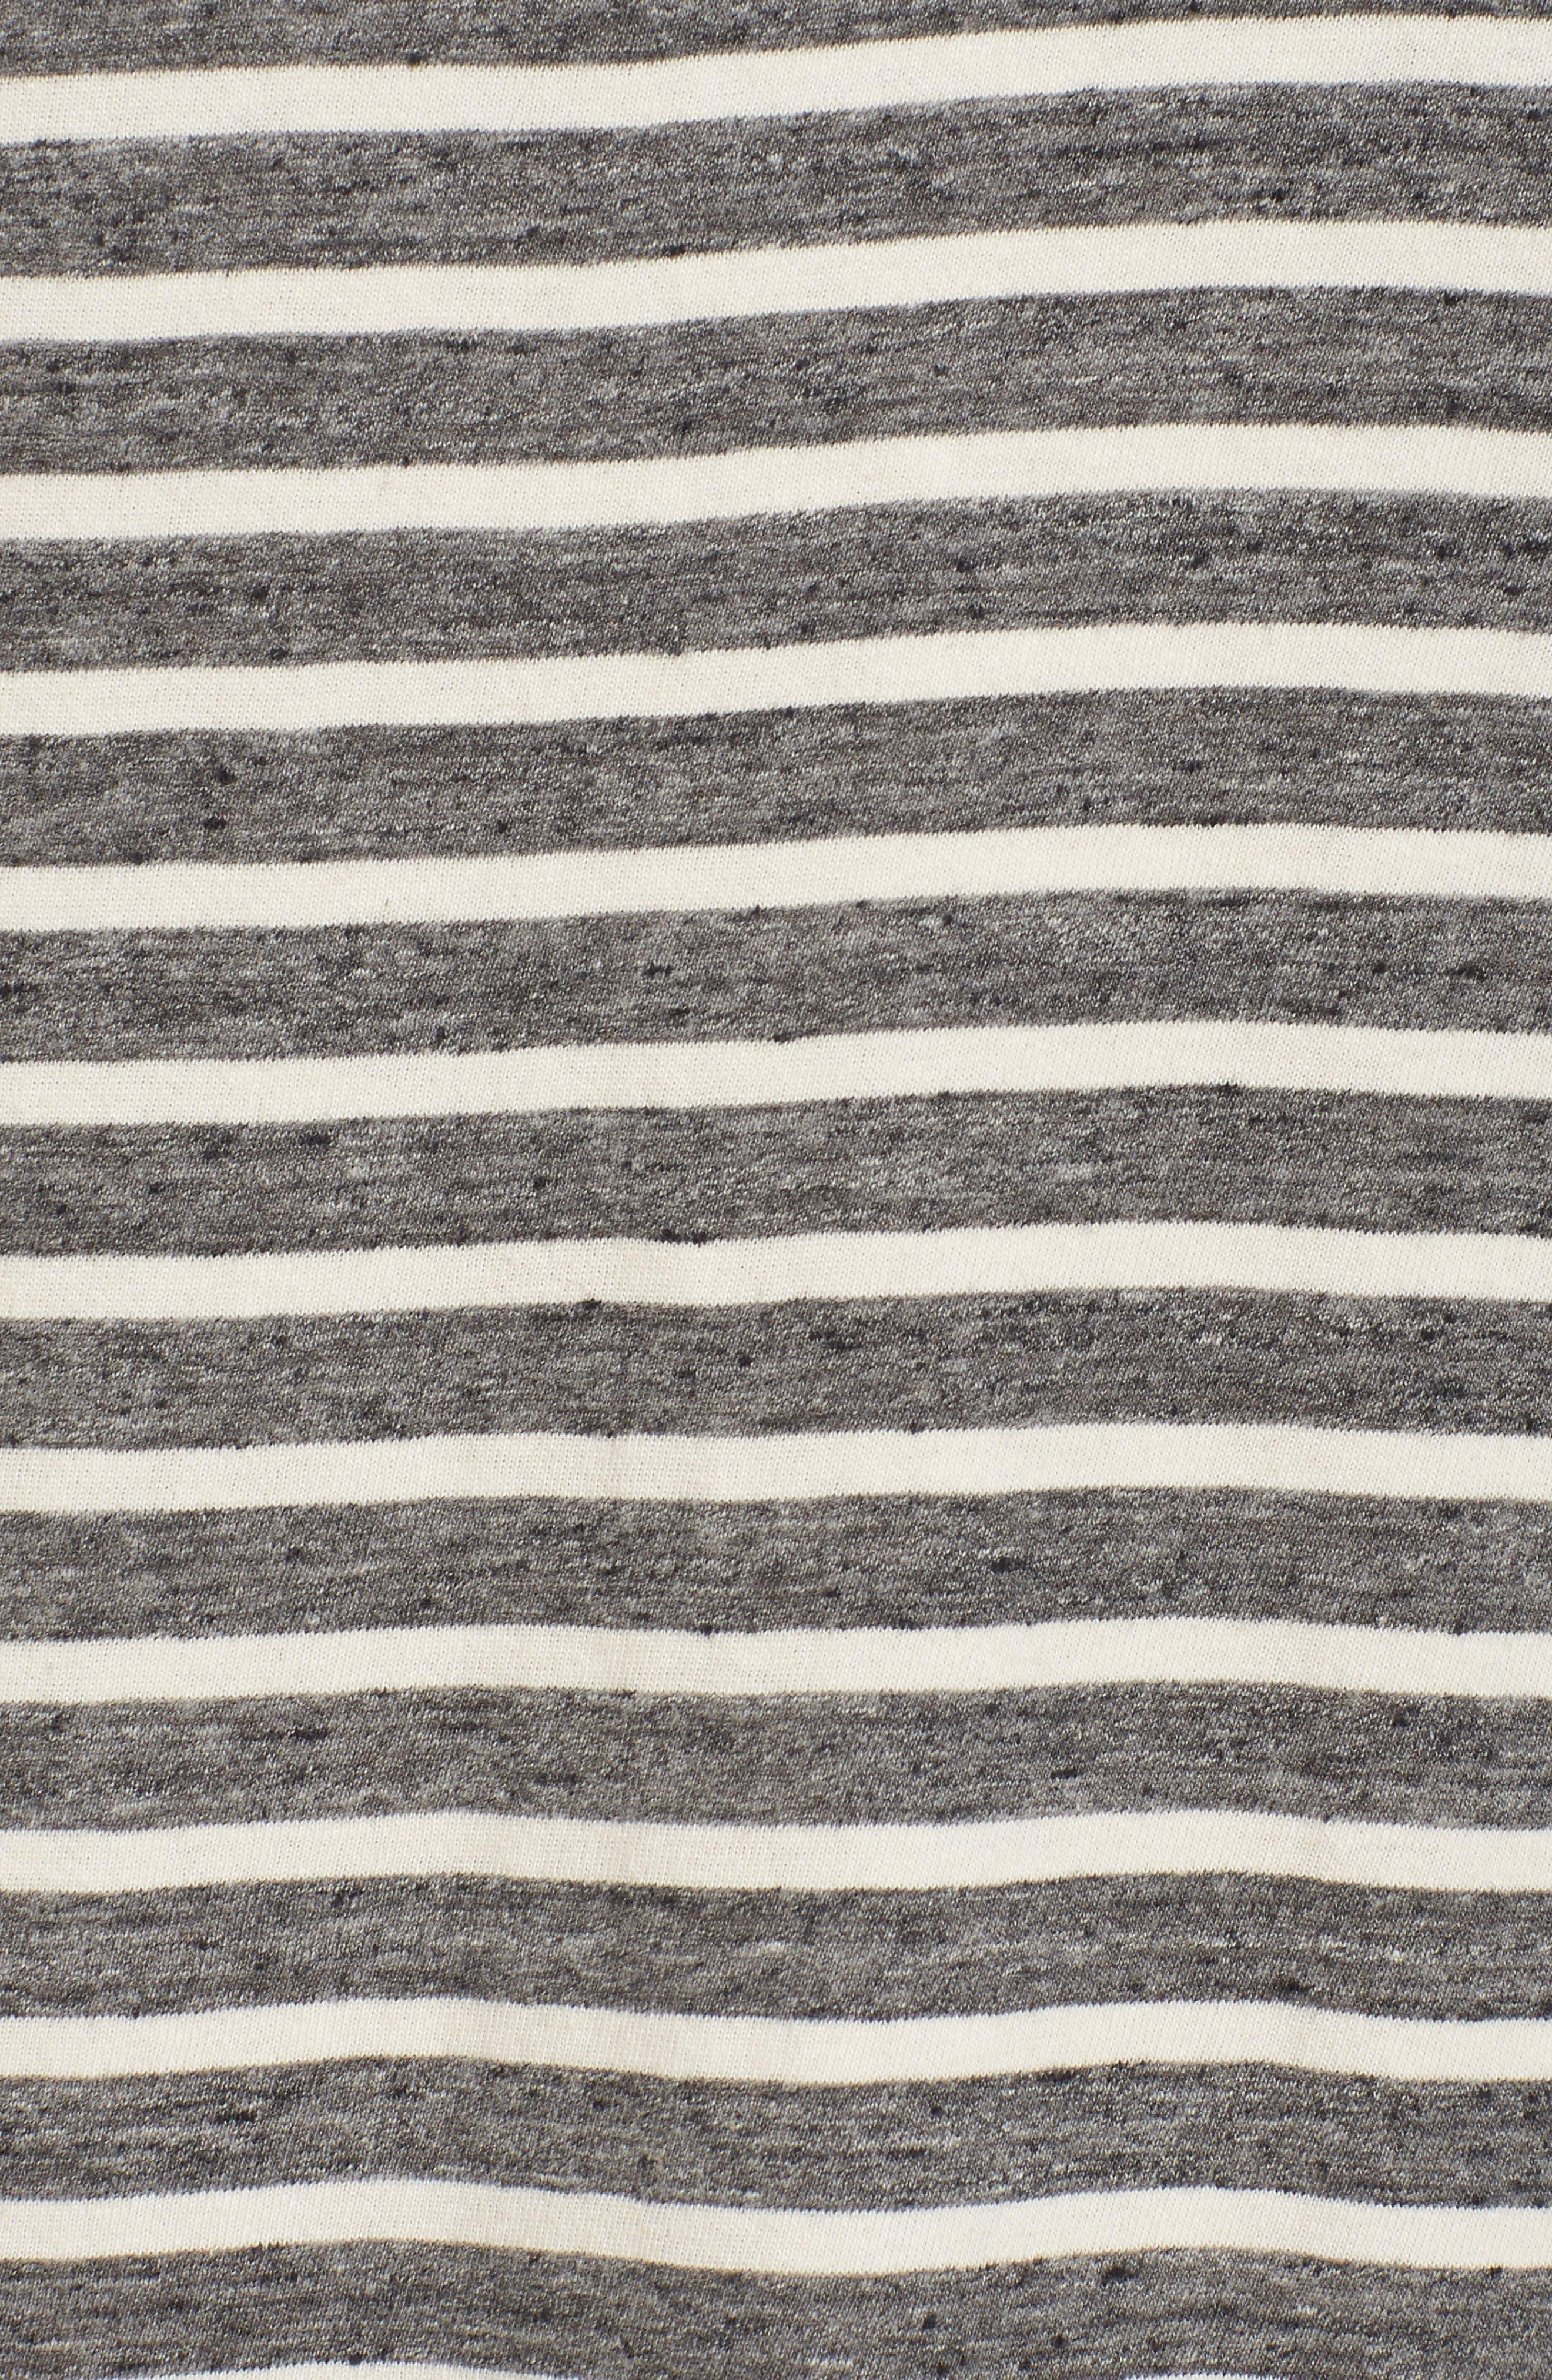 Stripe Knit T-Shirt Dress,                             Alternate thumbnail 5, color,                             Charcoal Anchor Stripe